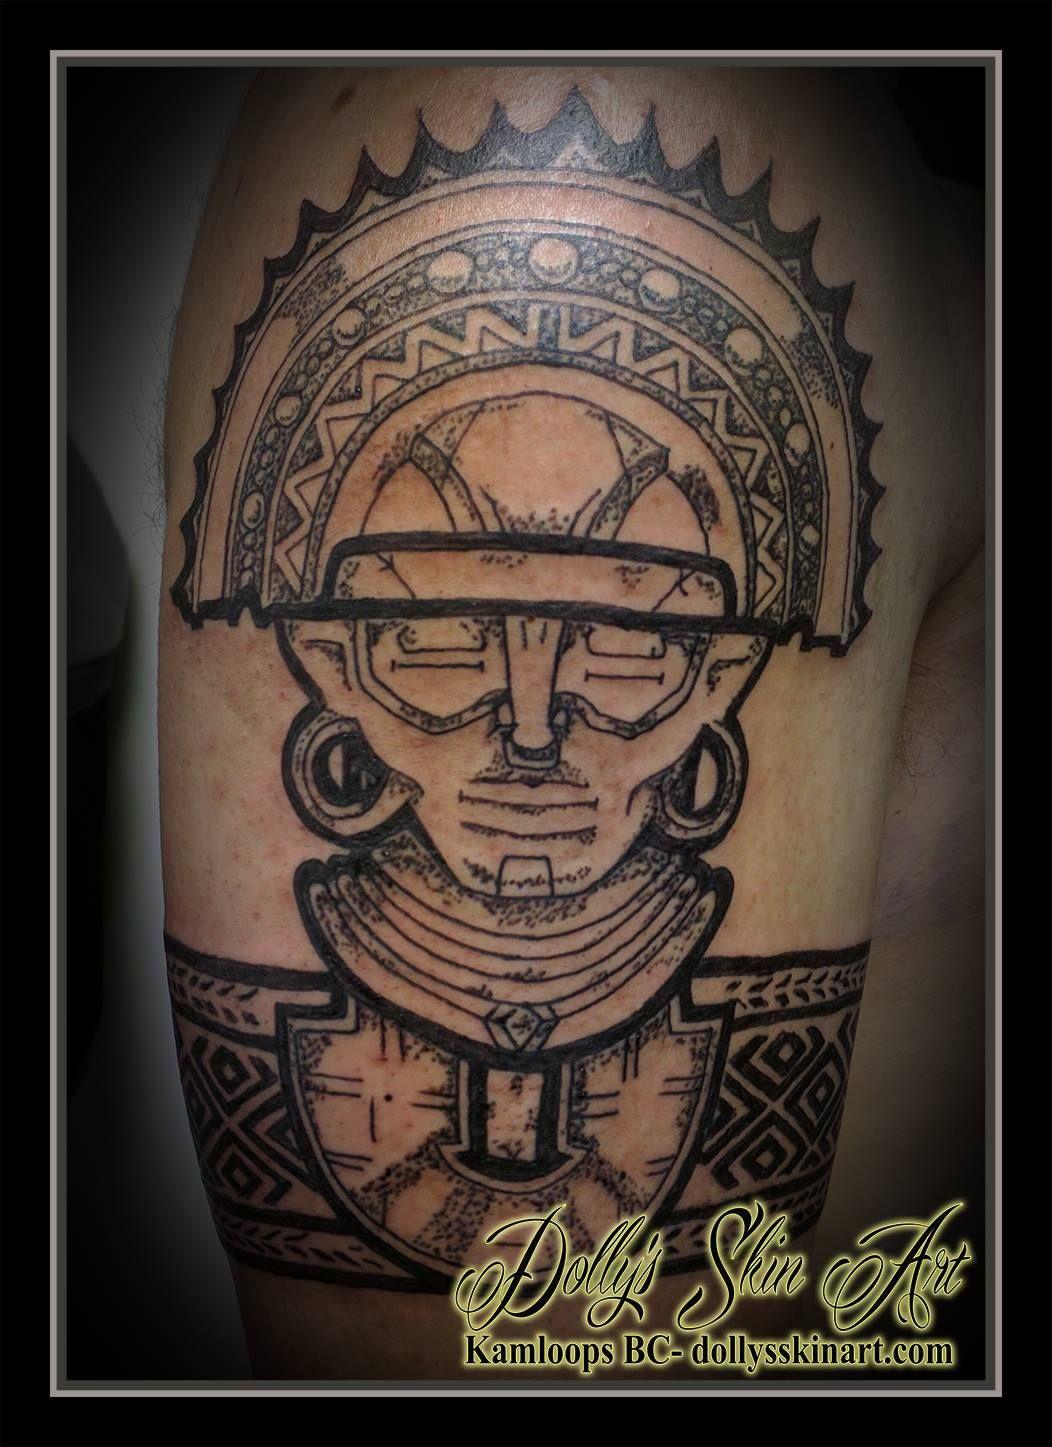 Colombian Tribal Tattoo : colombian, tribal, tattoo, Dorado, Muisca, Colombia, Central, America, Andean, Mythology, Black, Stipple, Blackwork, Armband…, Armband, Tattoo, Design,, Tattoos,, Tribal, Shoulder, Tattoos